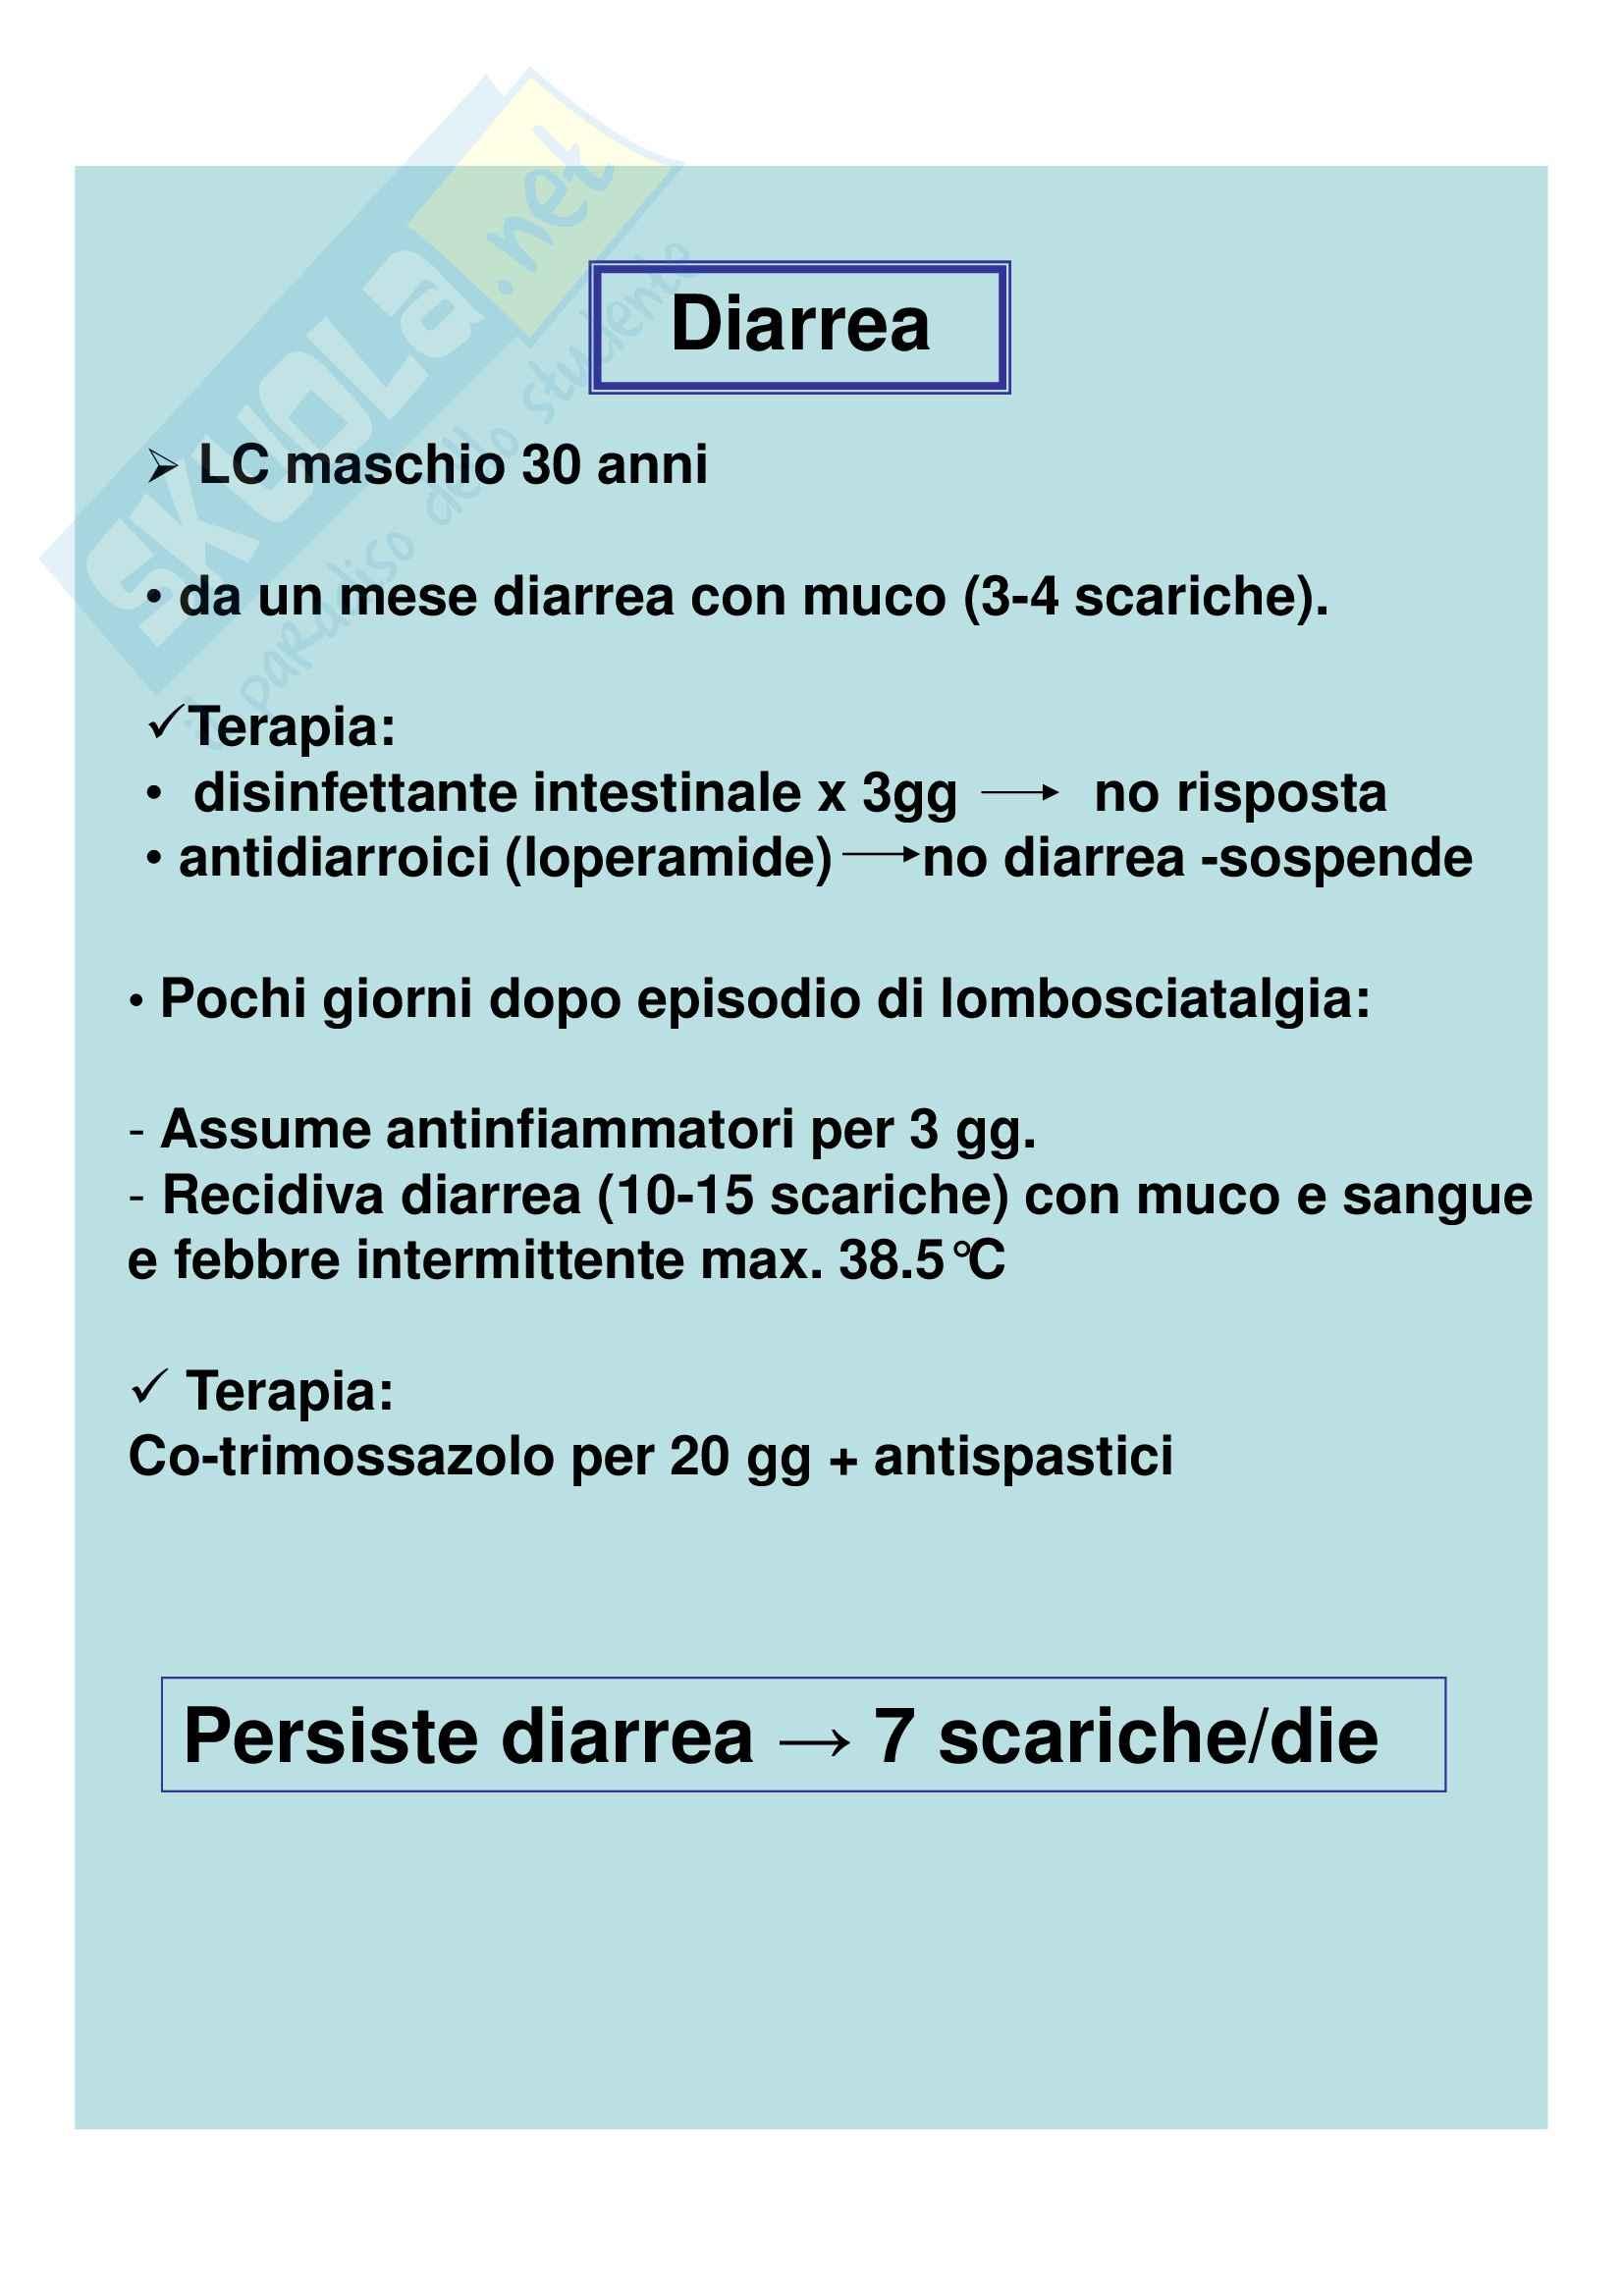 Medicina interna - diarrea cronica